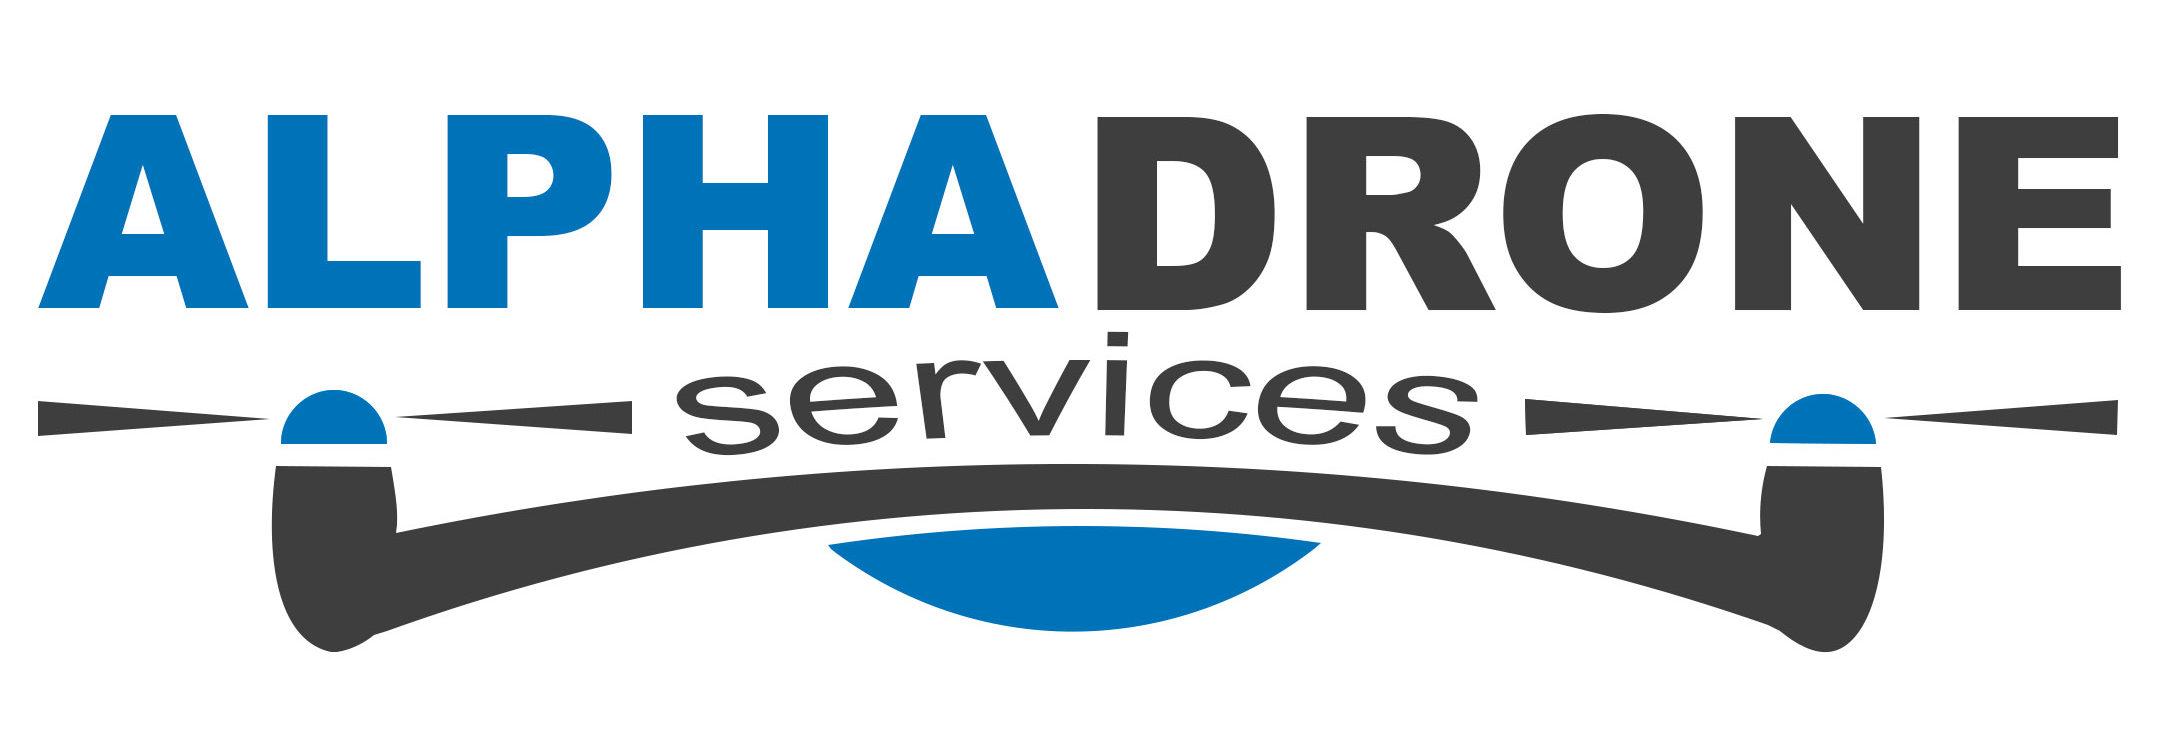 Alpha drone services